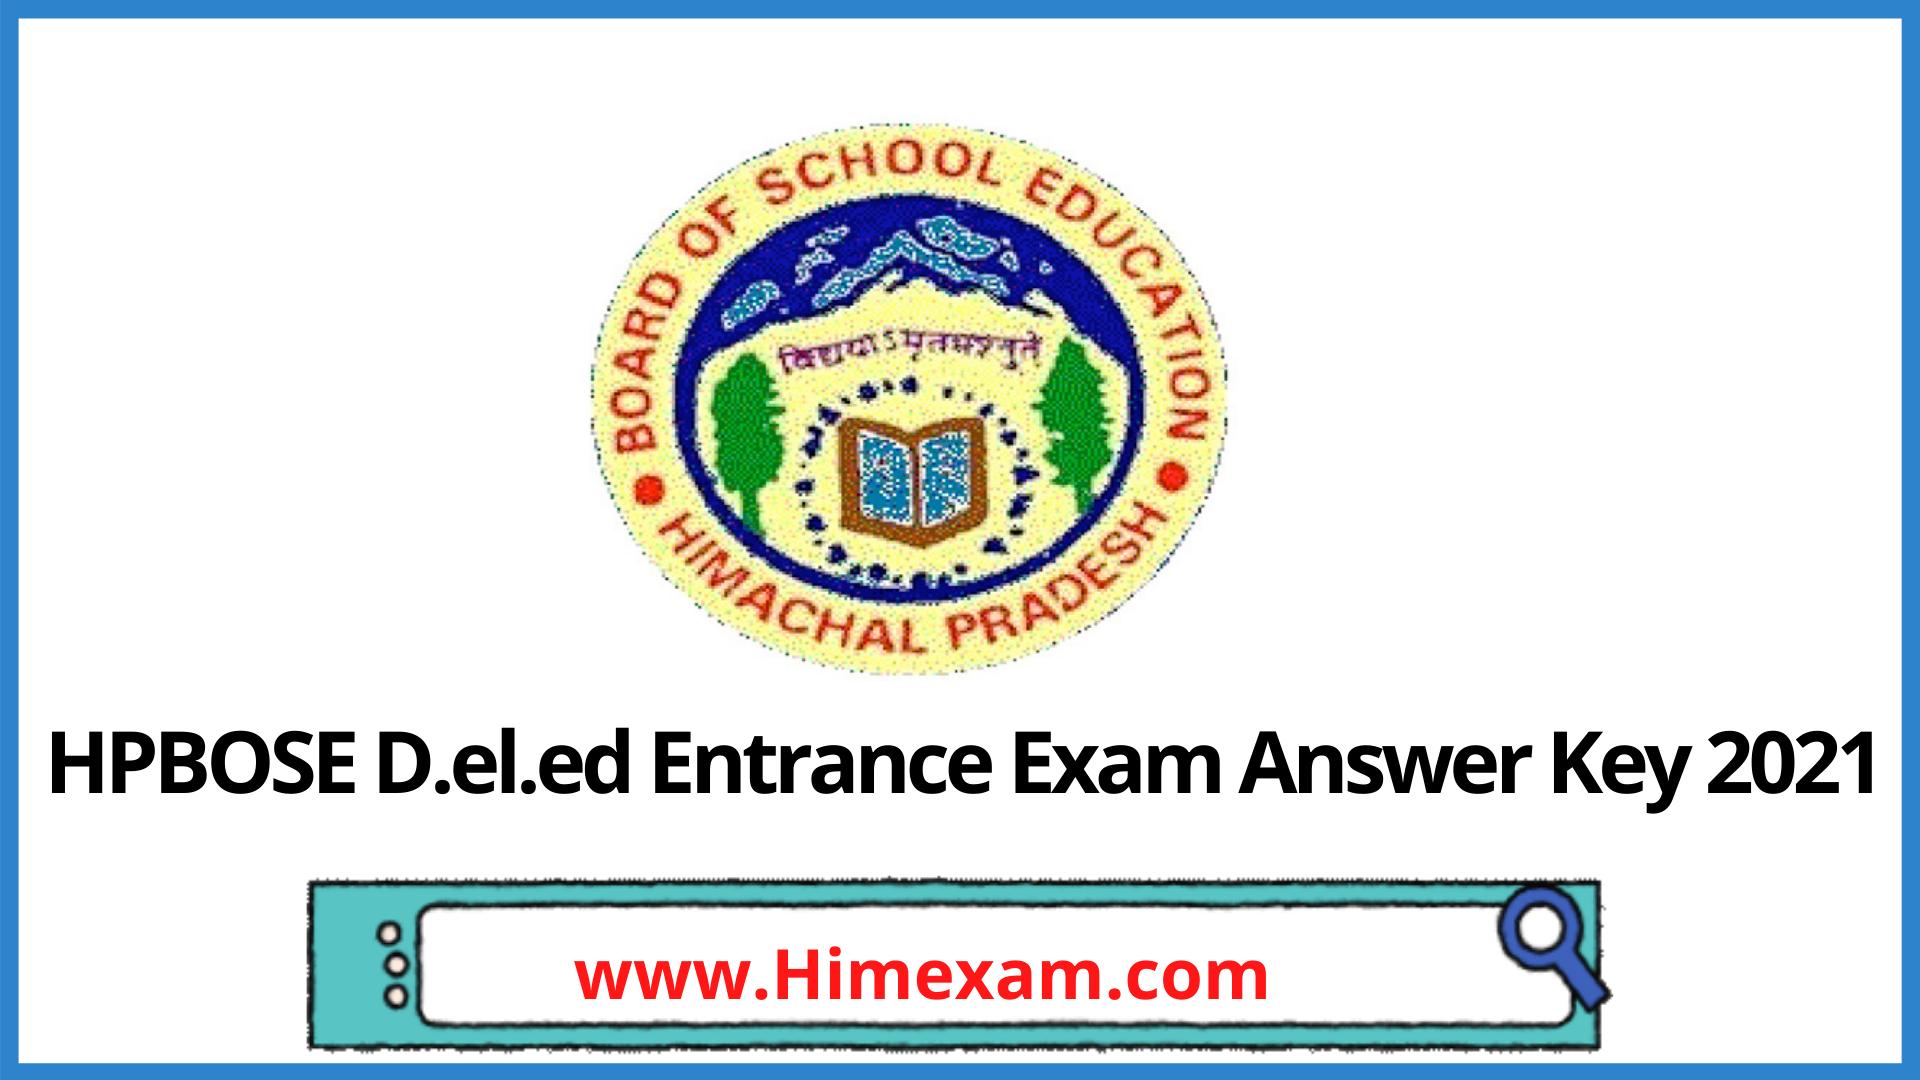 HPBOSE D.el.ed Entrance Exam Answer Key 2021